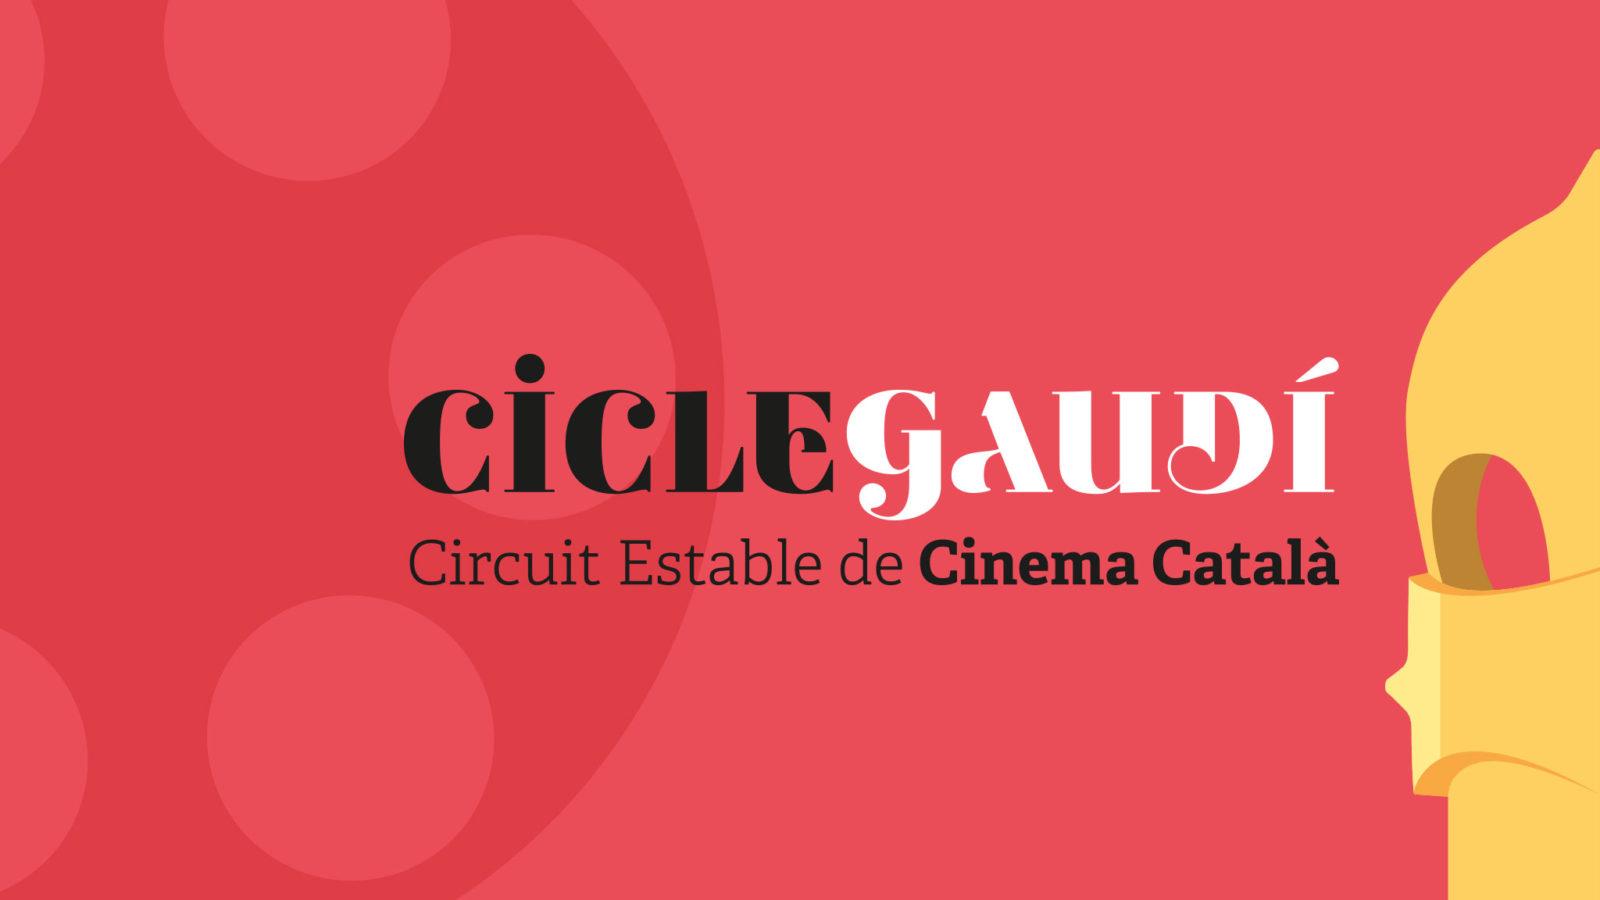 Cicle Gaudí a Badalona